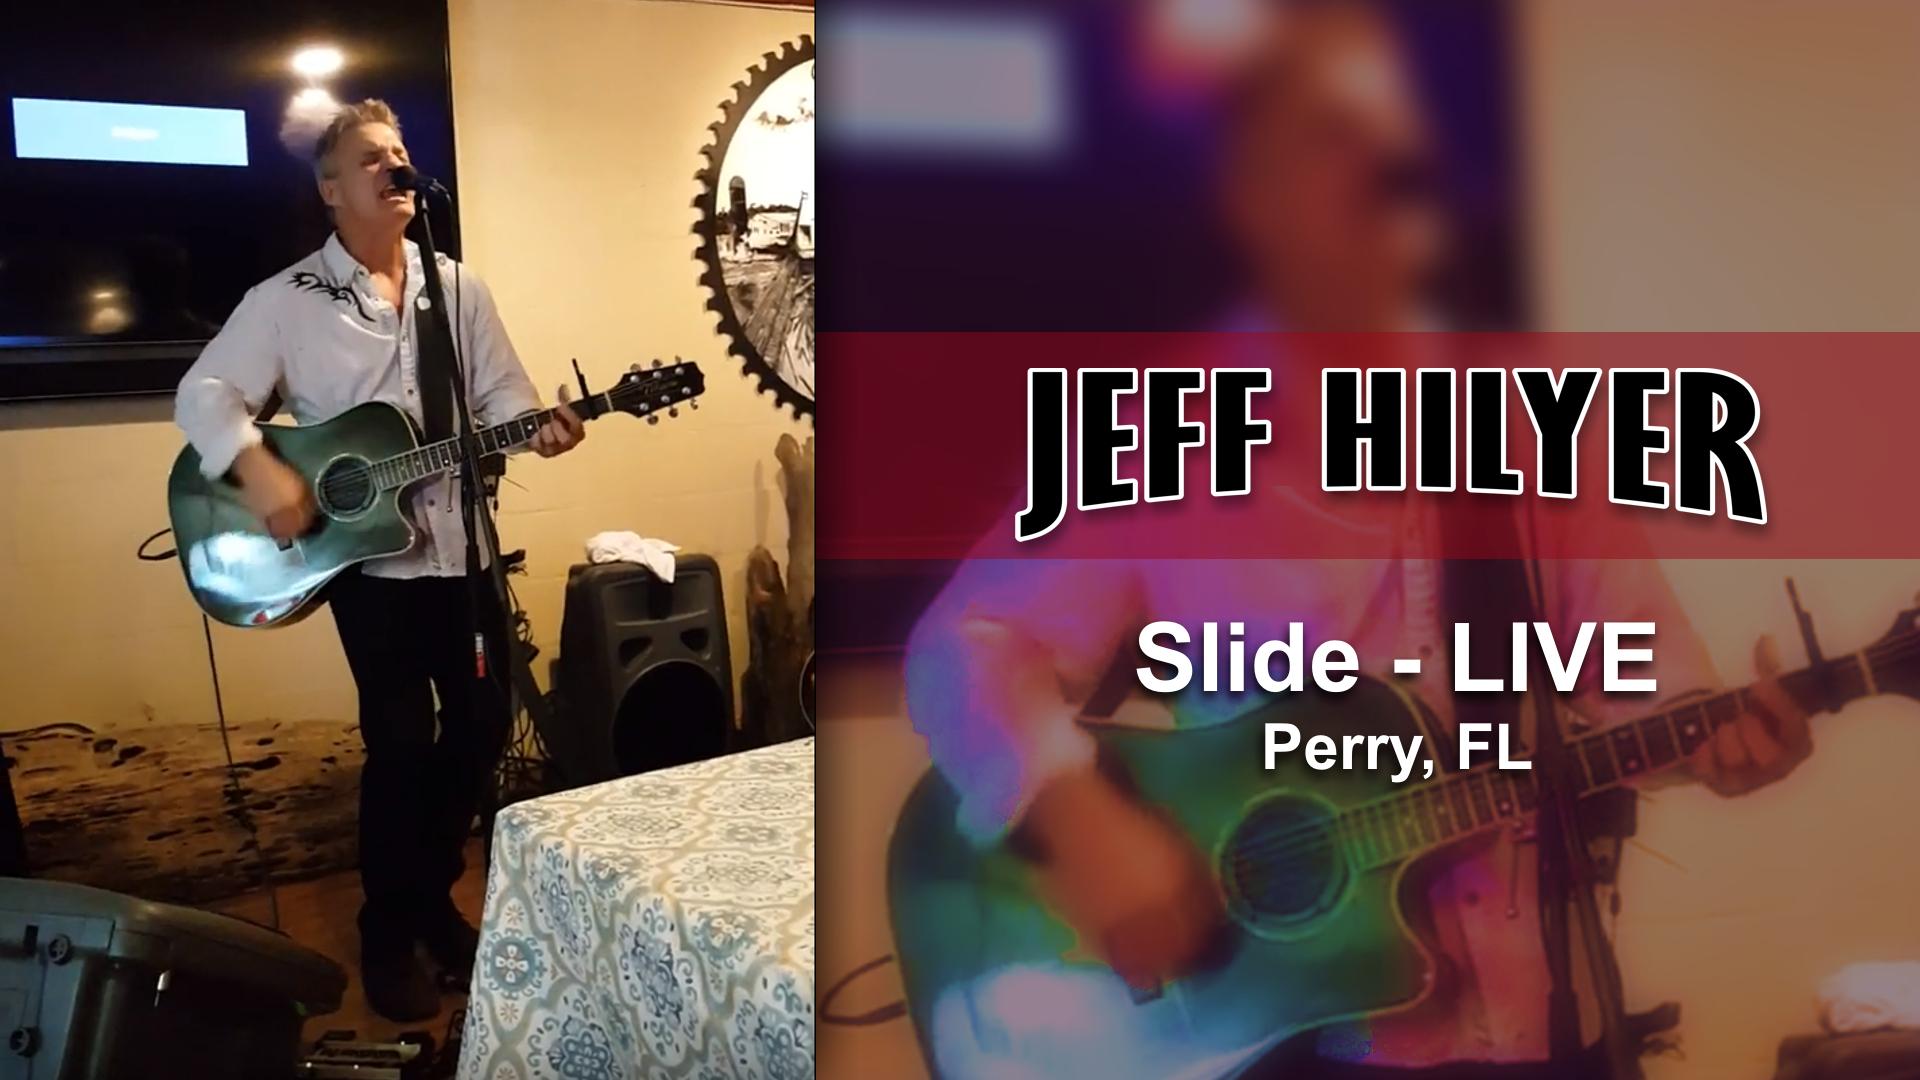 Jeff Hilyer - Slide